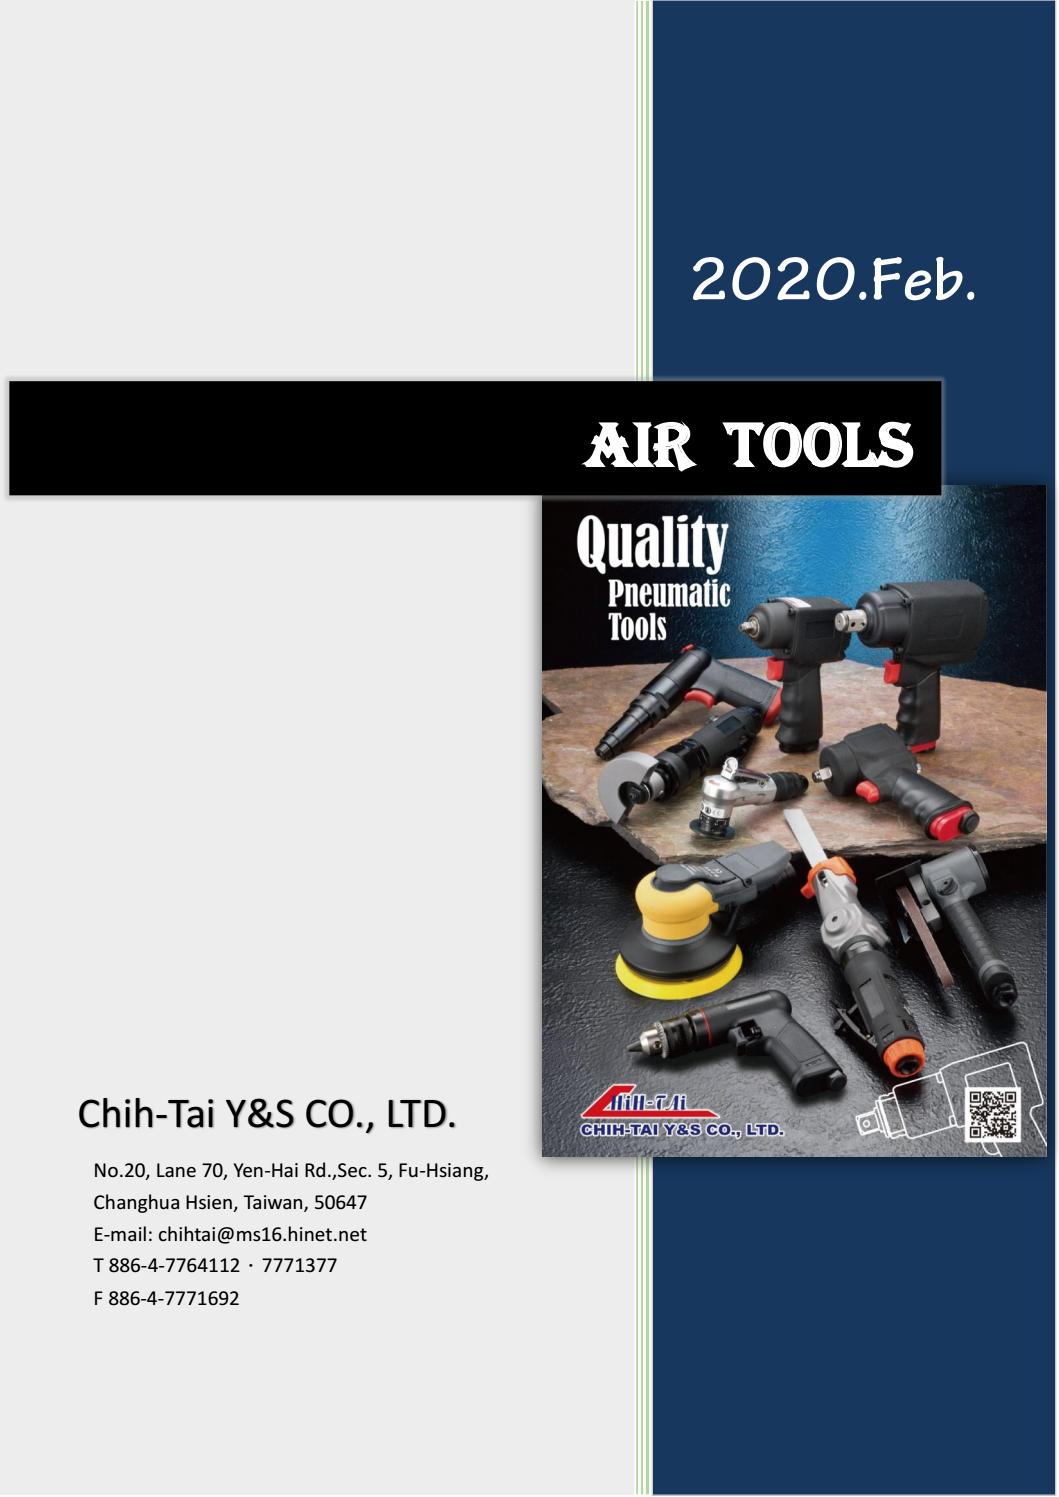 Air Disc Sander Polisher Palm 6 Inch Low Vibration 11000 RPM 4 CFM 90 PSI Tool